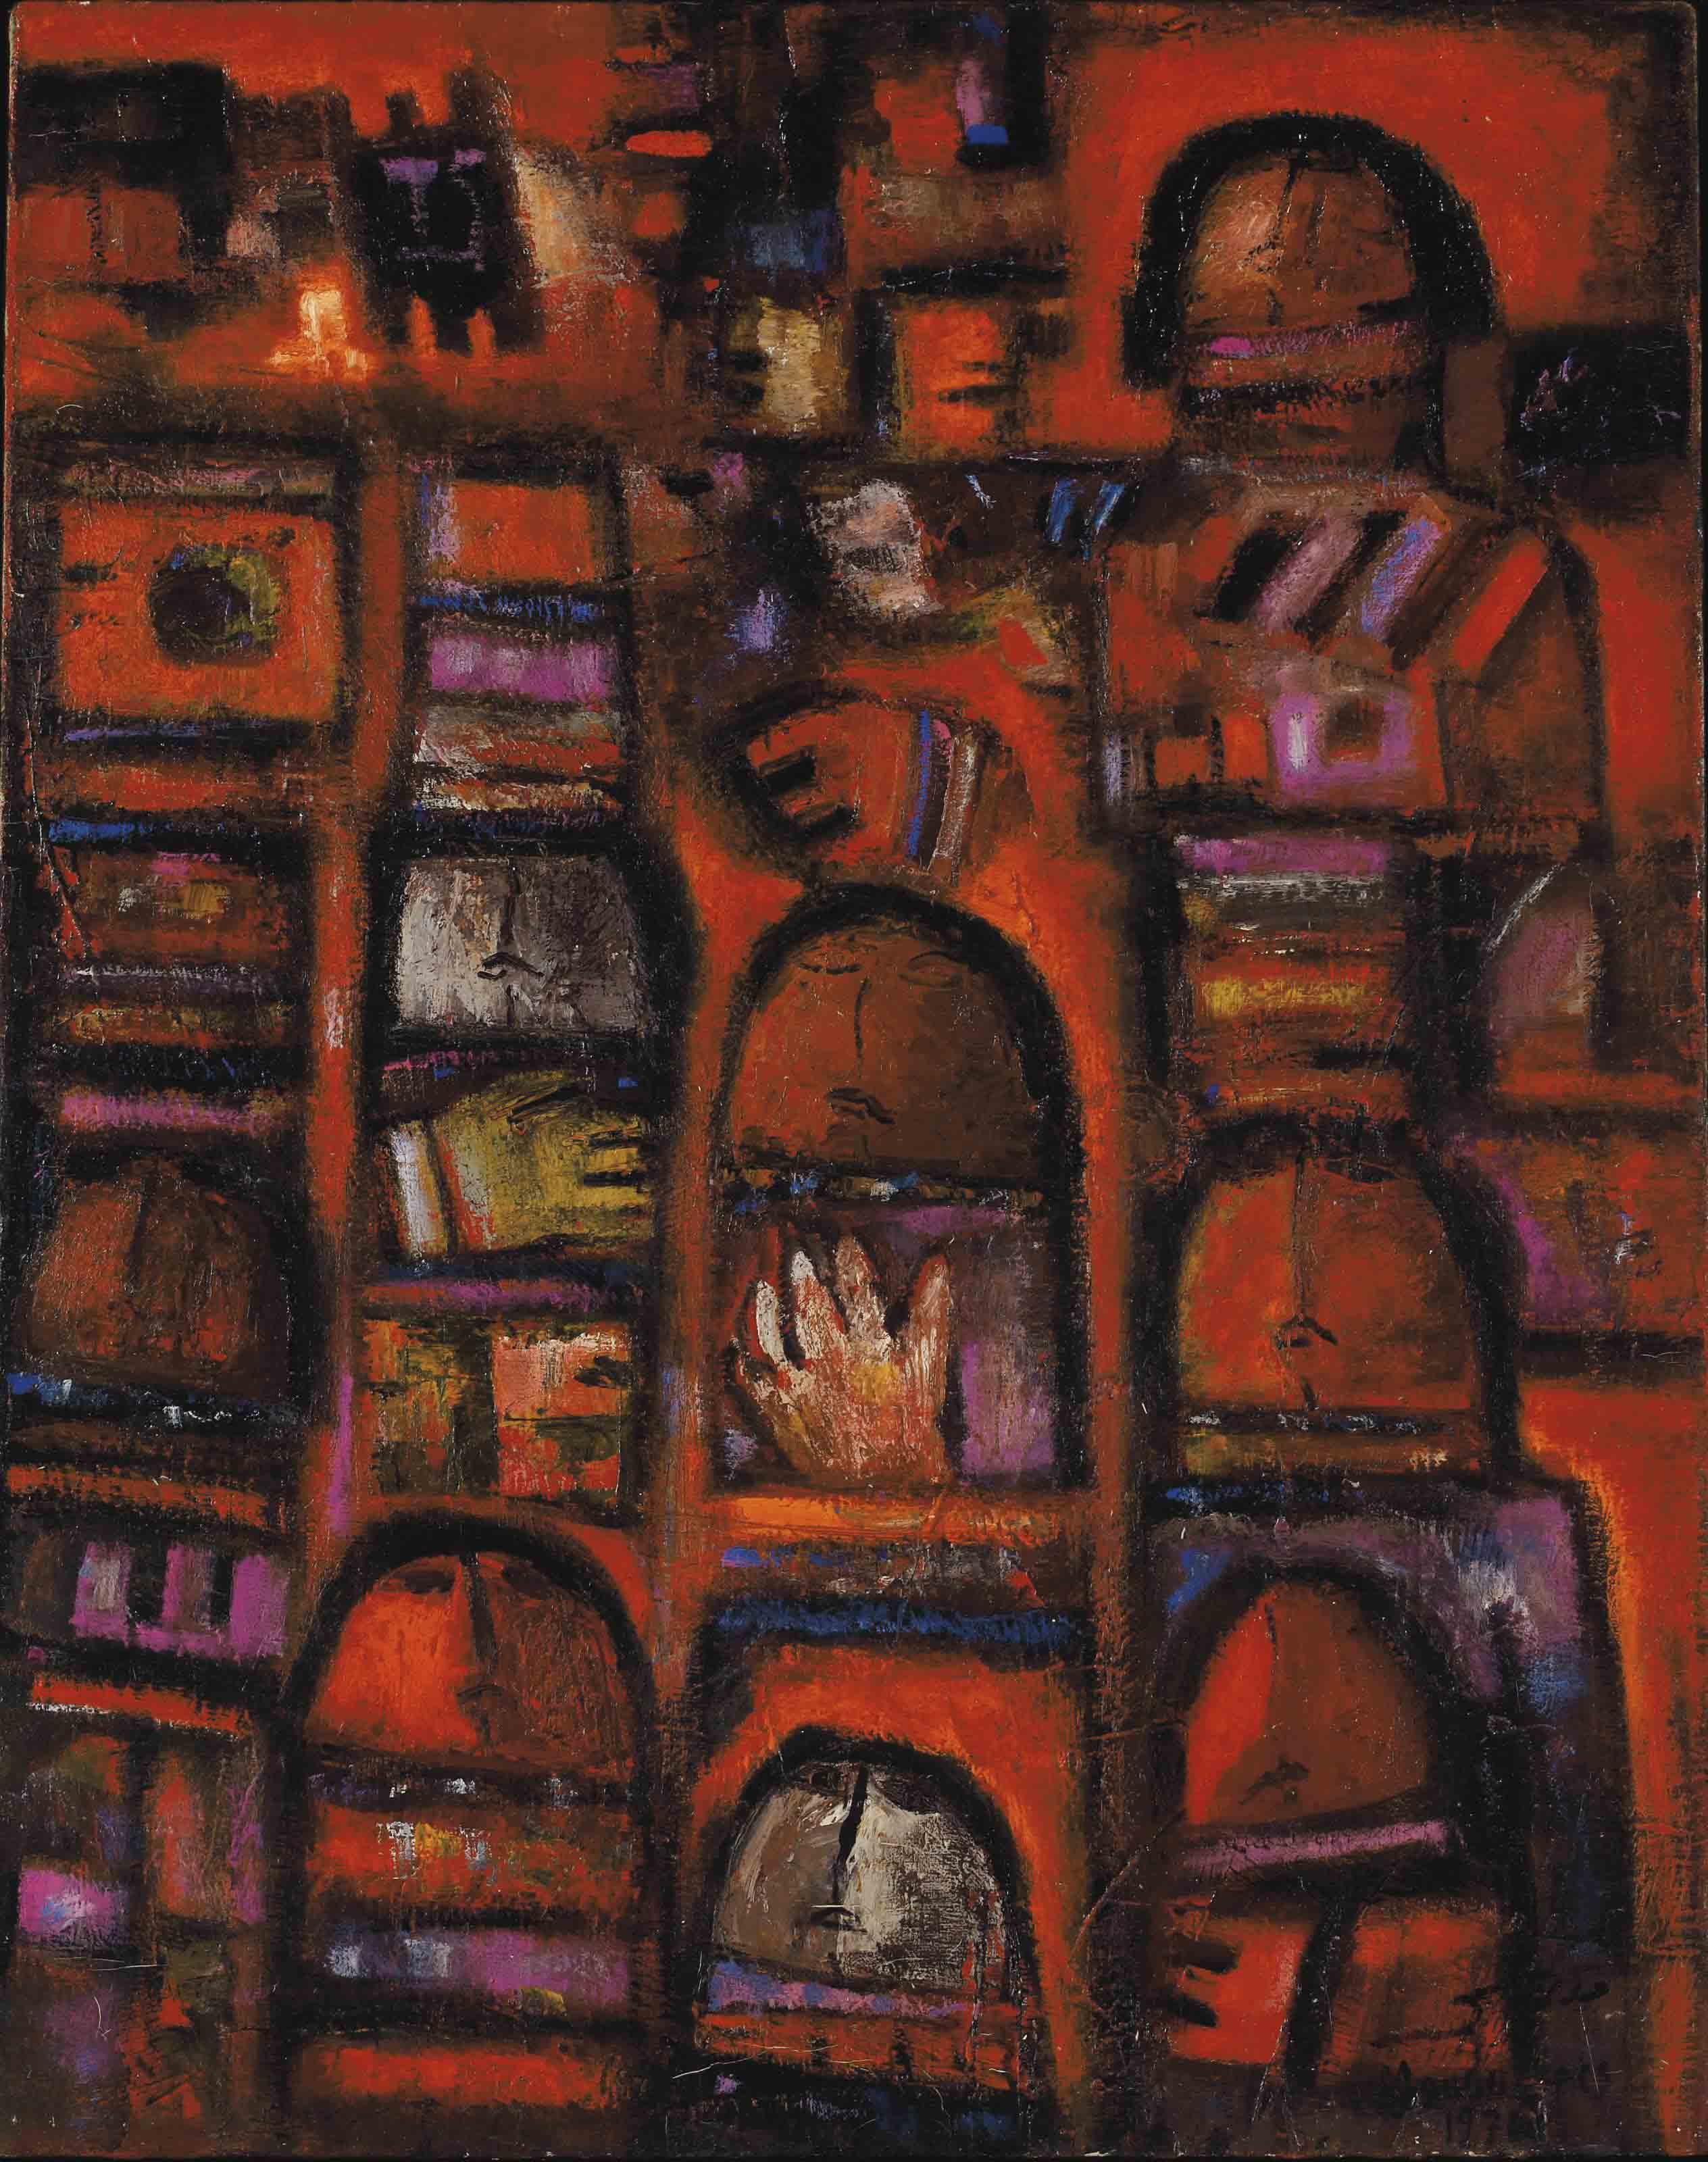 Fateh Moudarres (Syrian, 1922-